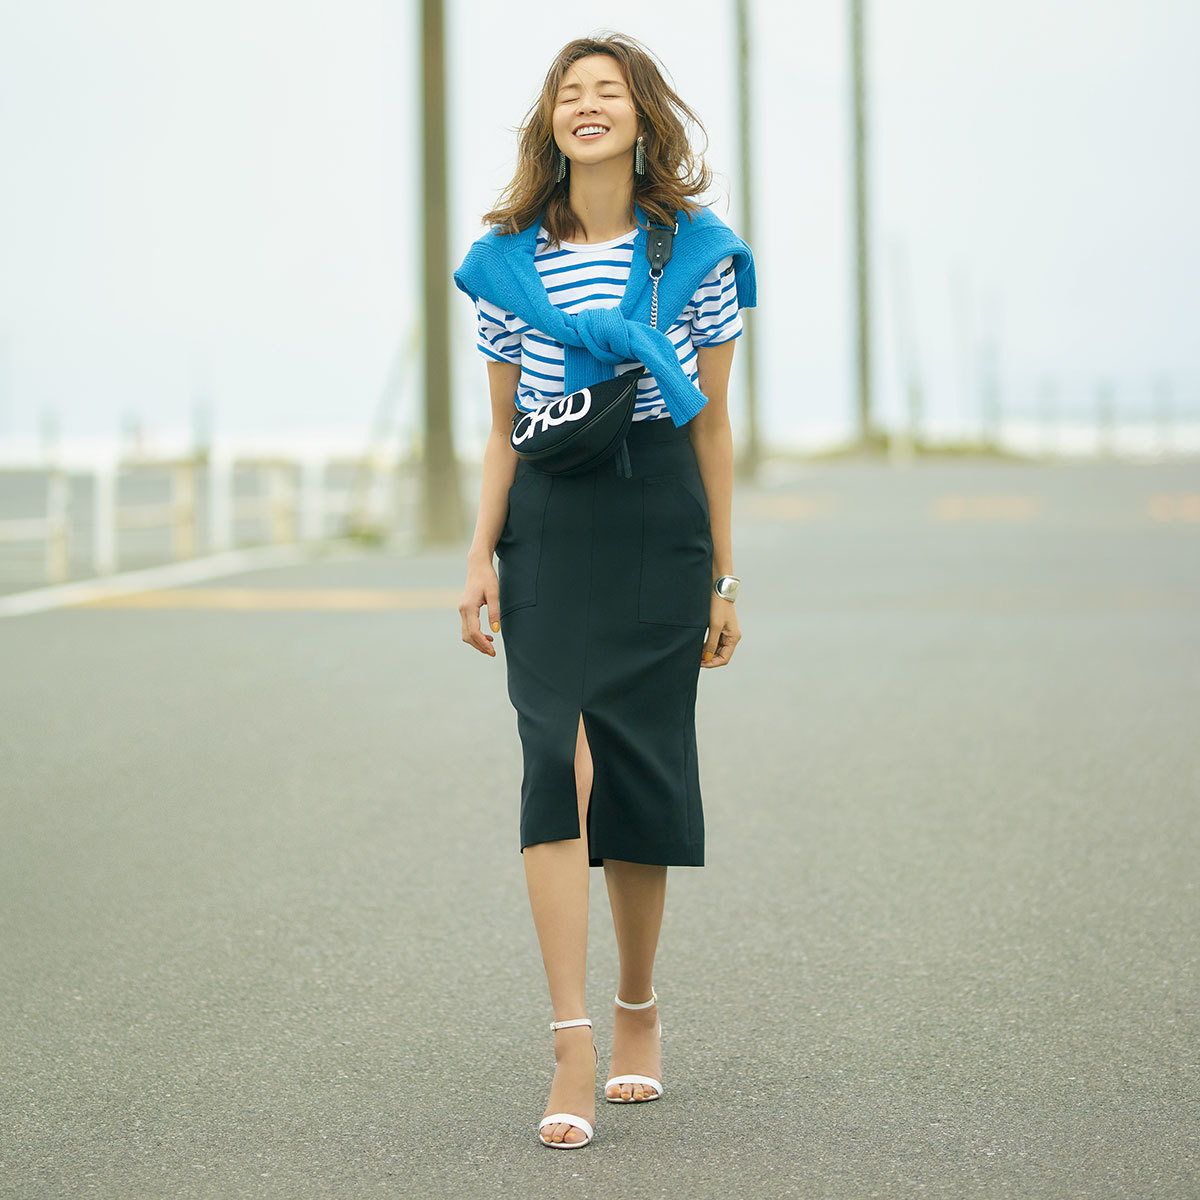 SHIHOが着るコバルトブルーを使ったスカートコーデ